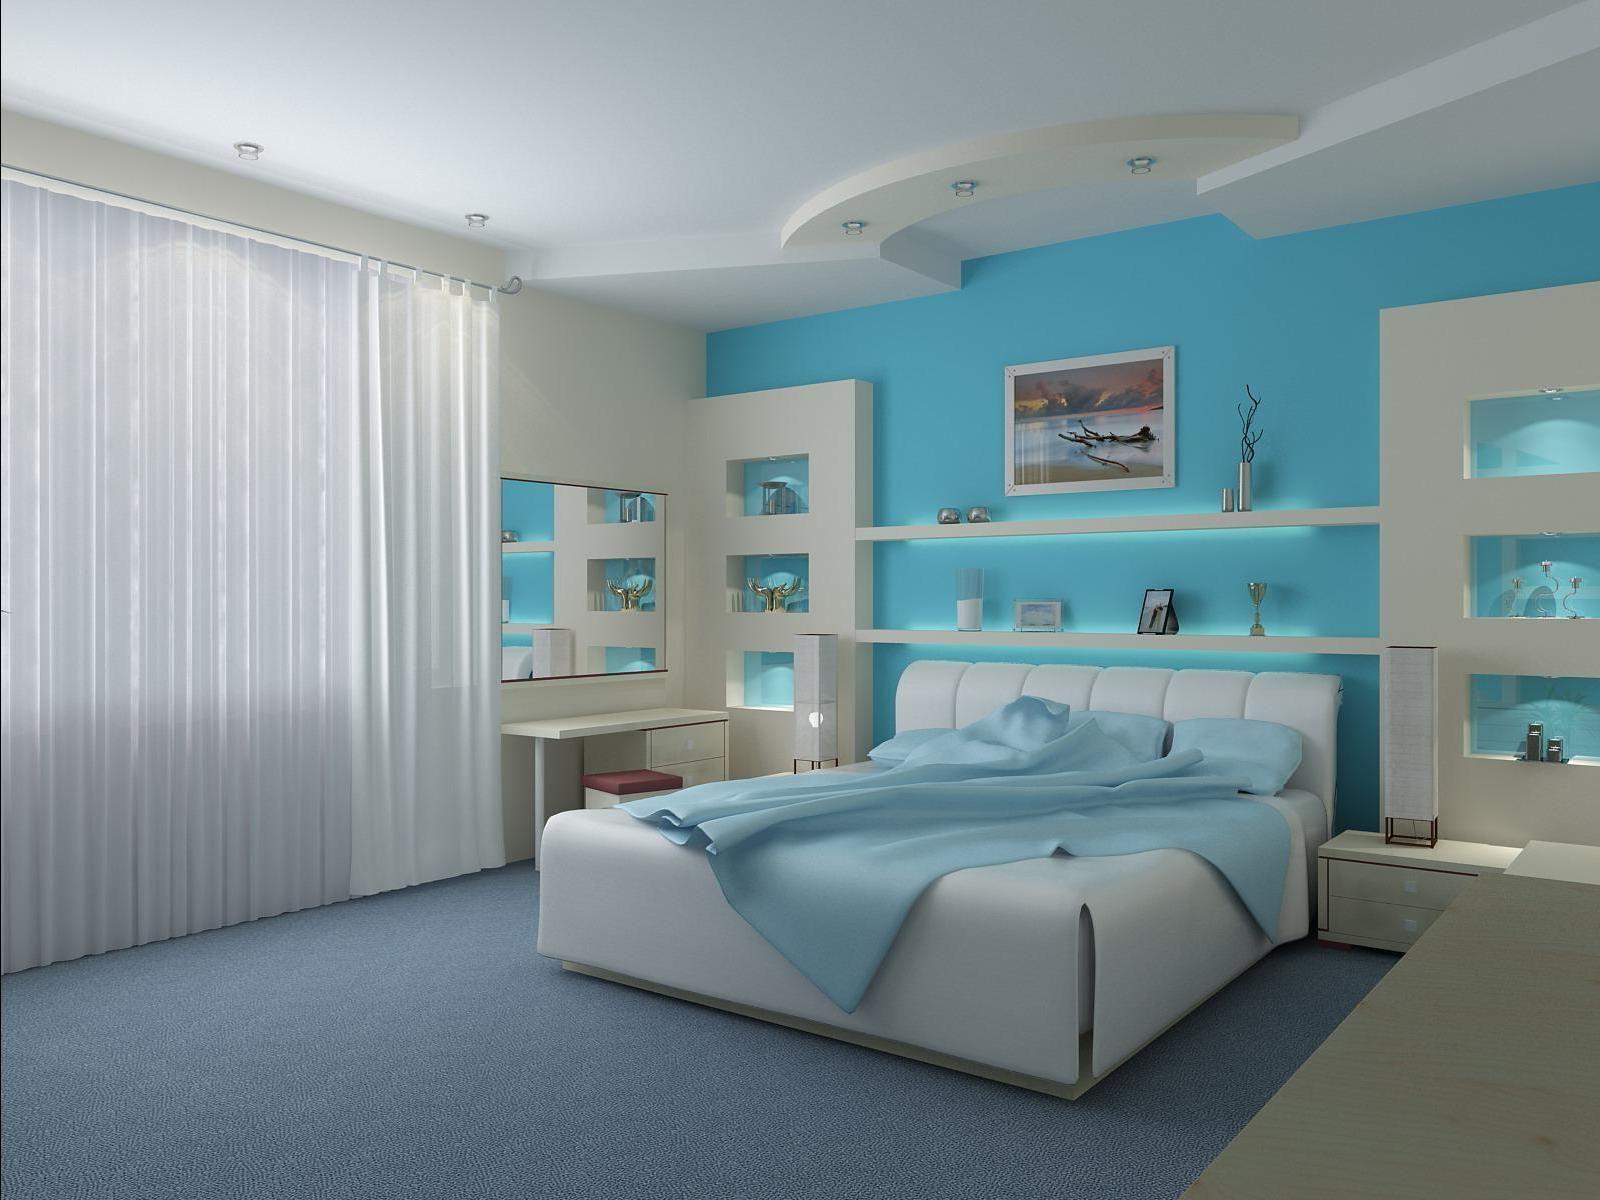 Дизайн комнаты голубого цвета